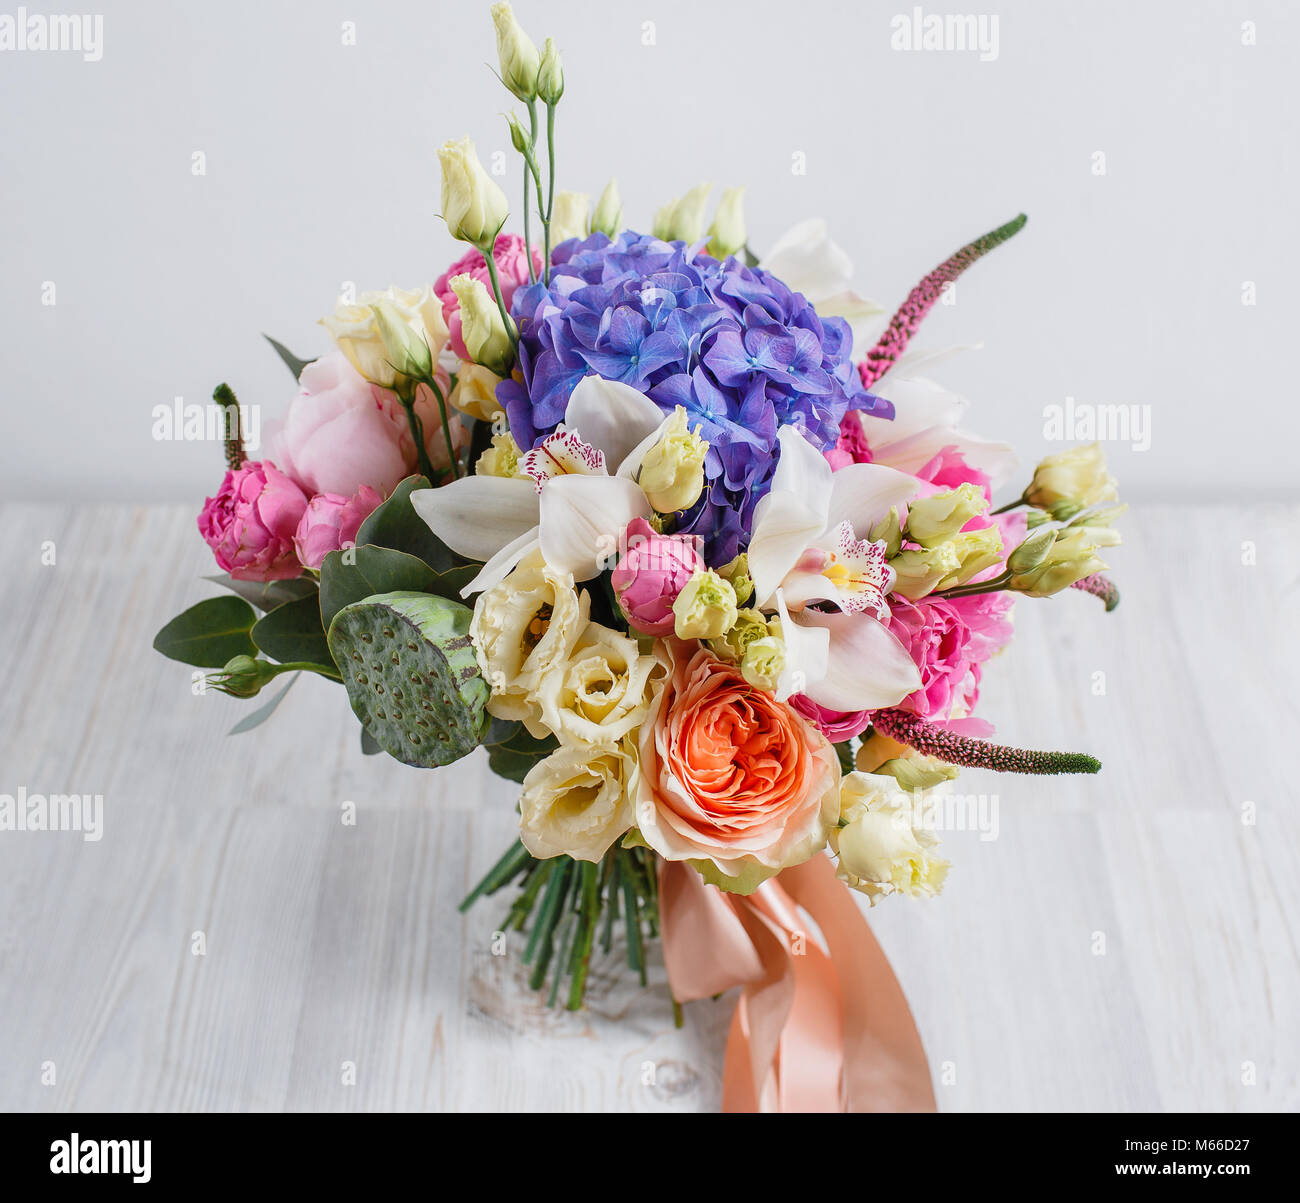 Beautiful bouquet of different flowers colorful color mix flower on beautiful bouquet of different flowers colorful color mix flower on a table izmirmasajfo